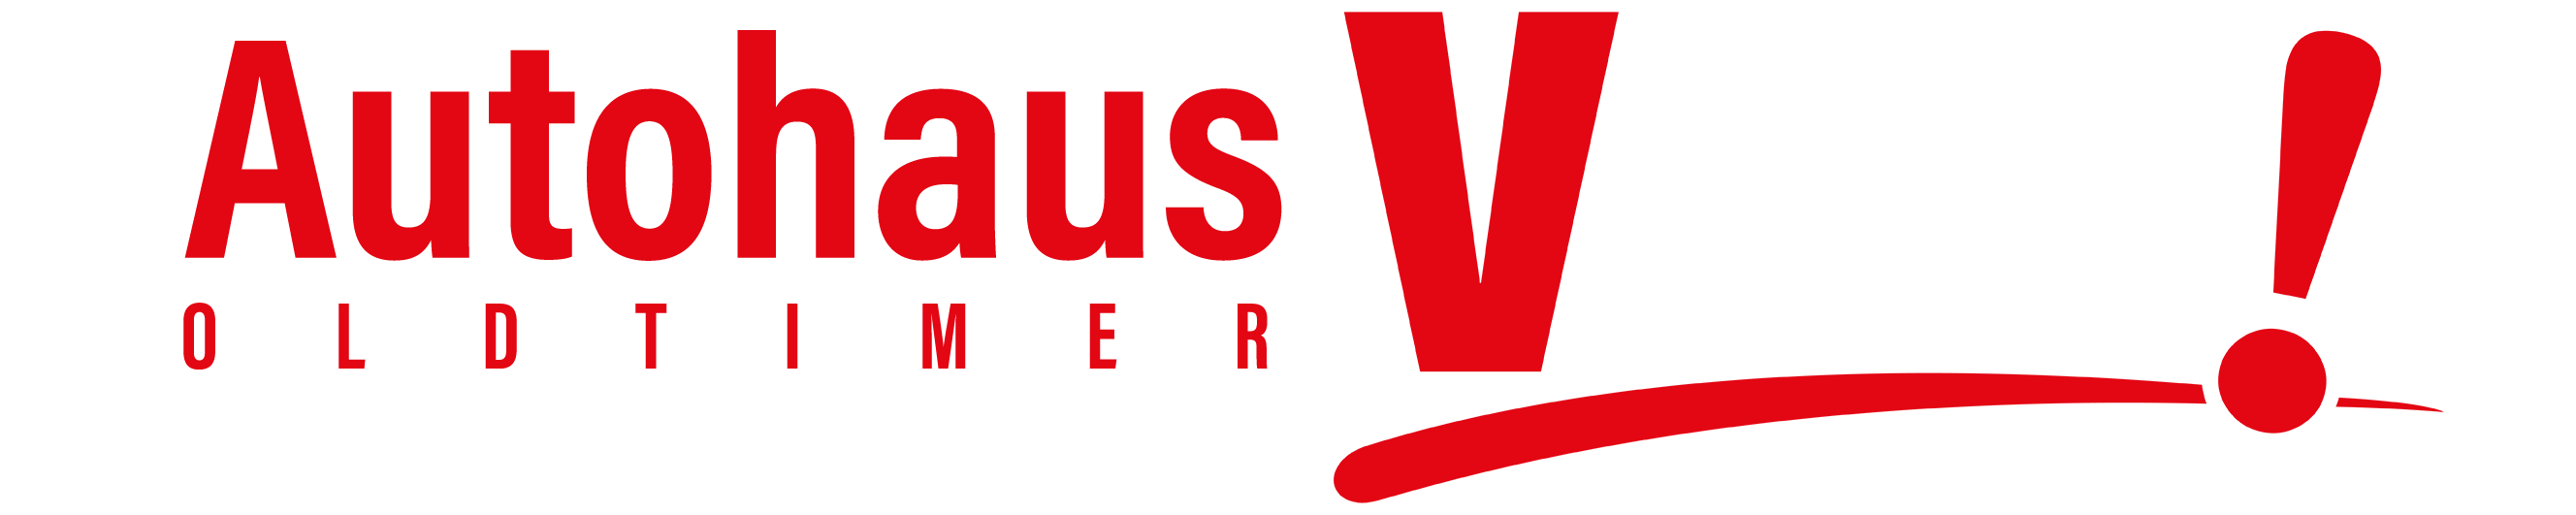 Autohaus Voss